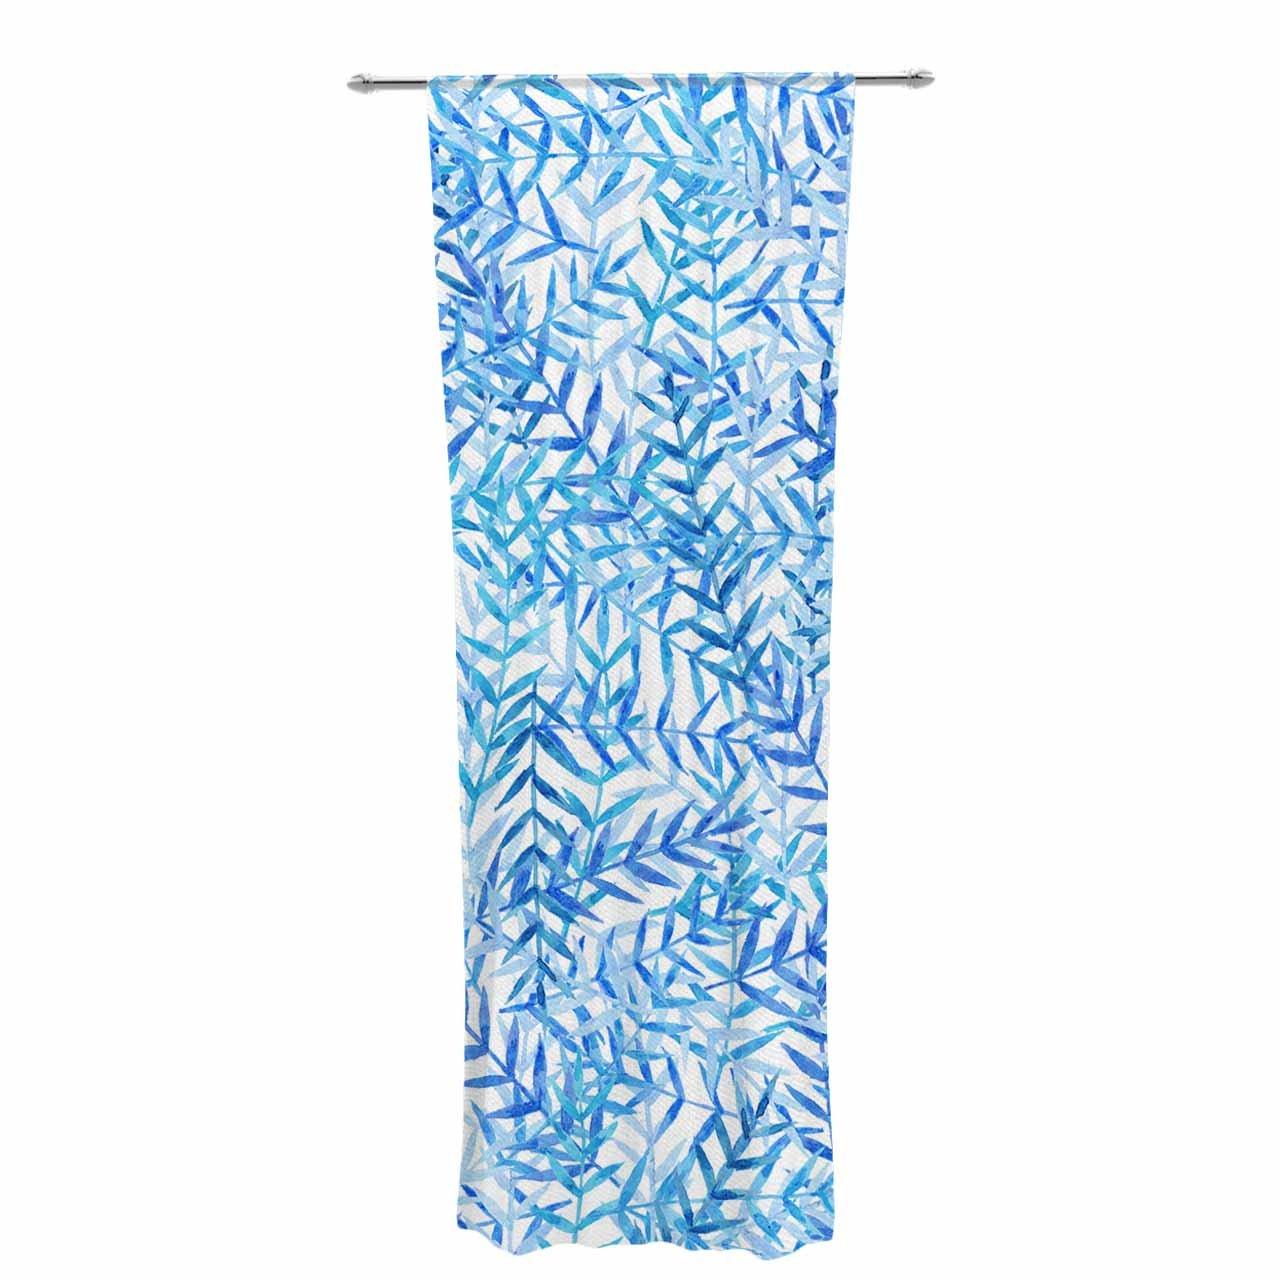 Kess InHouse Strawberringo Leaves Blue White Decorative Set 30 x 84 Sheer Curtains